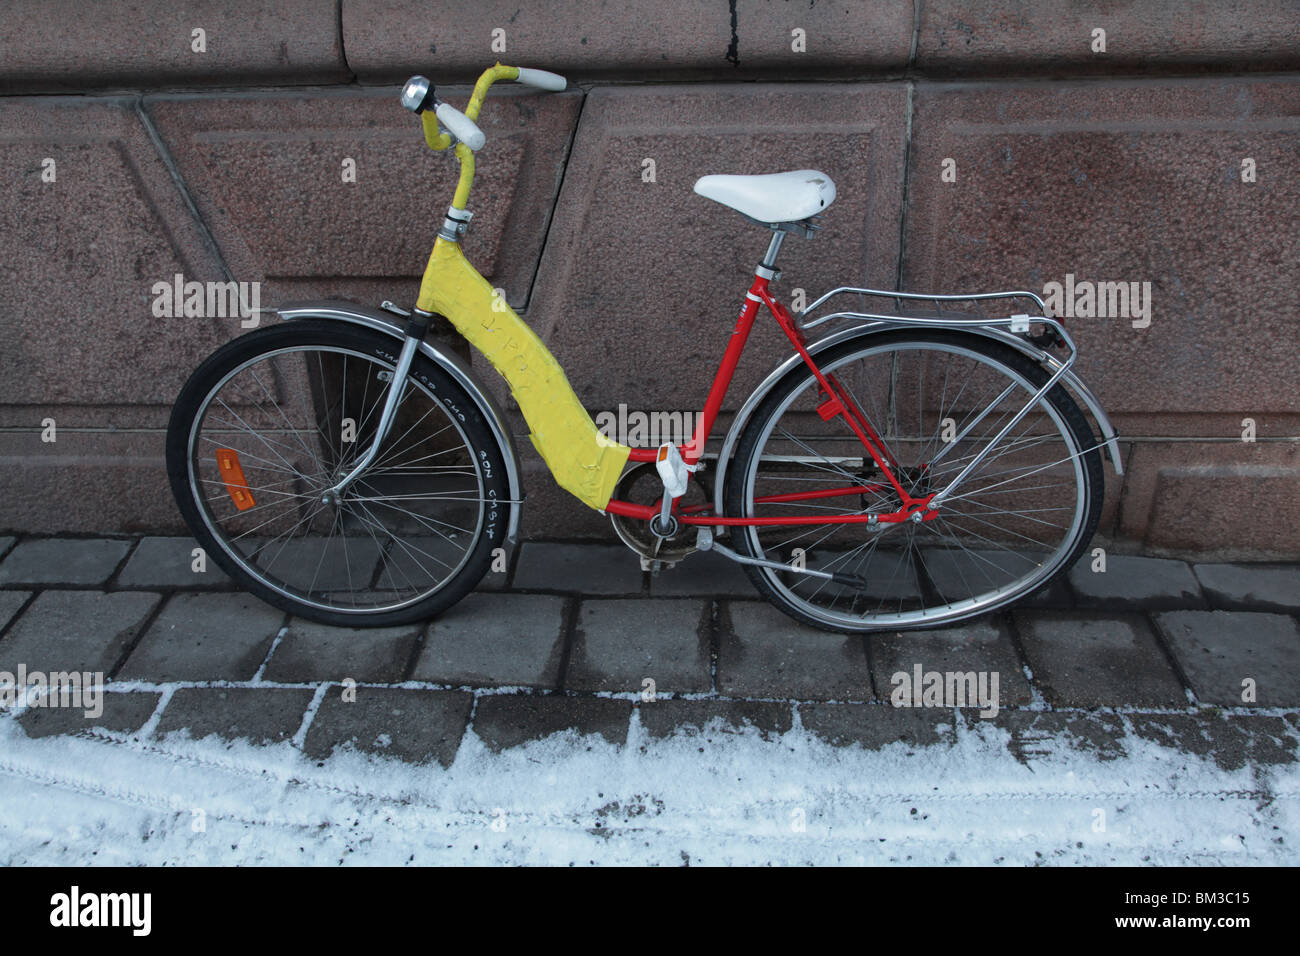 bike cycle bicycle abandoned broken warped wheel bent spokes snow Stock Photo